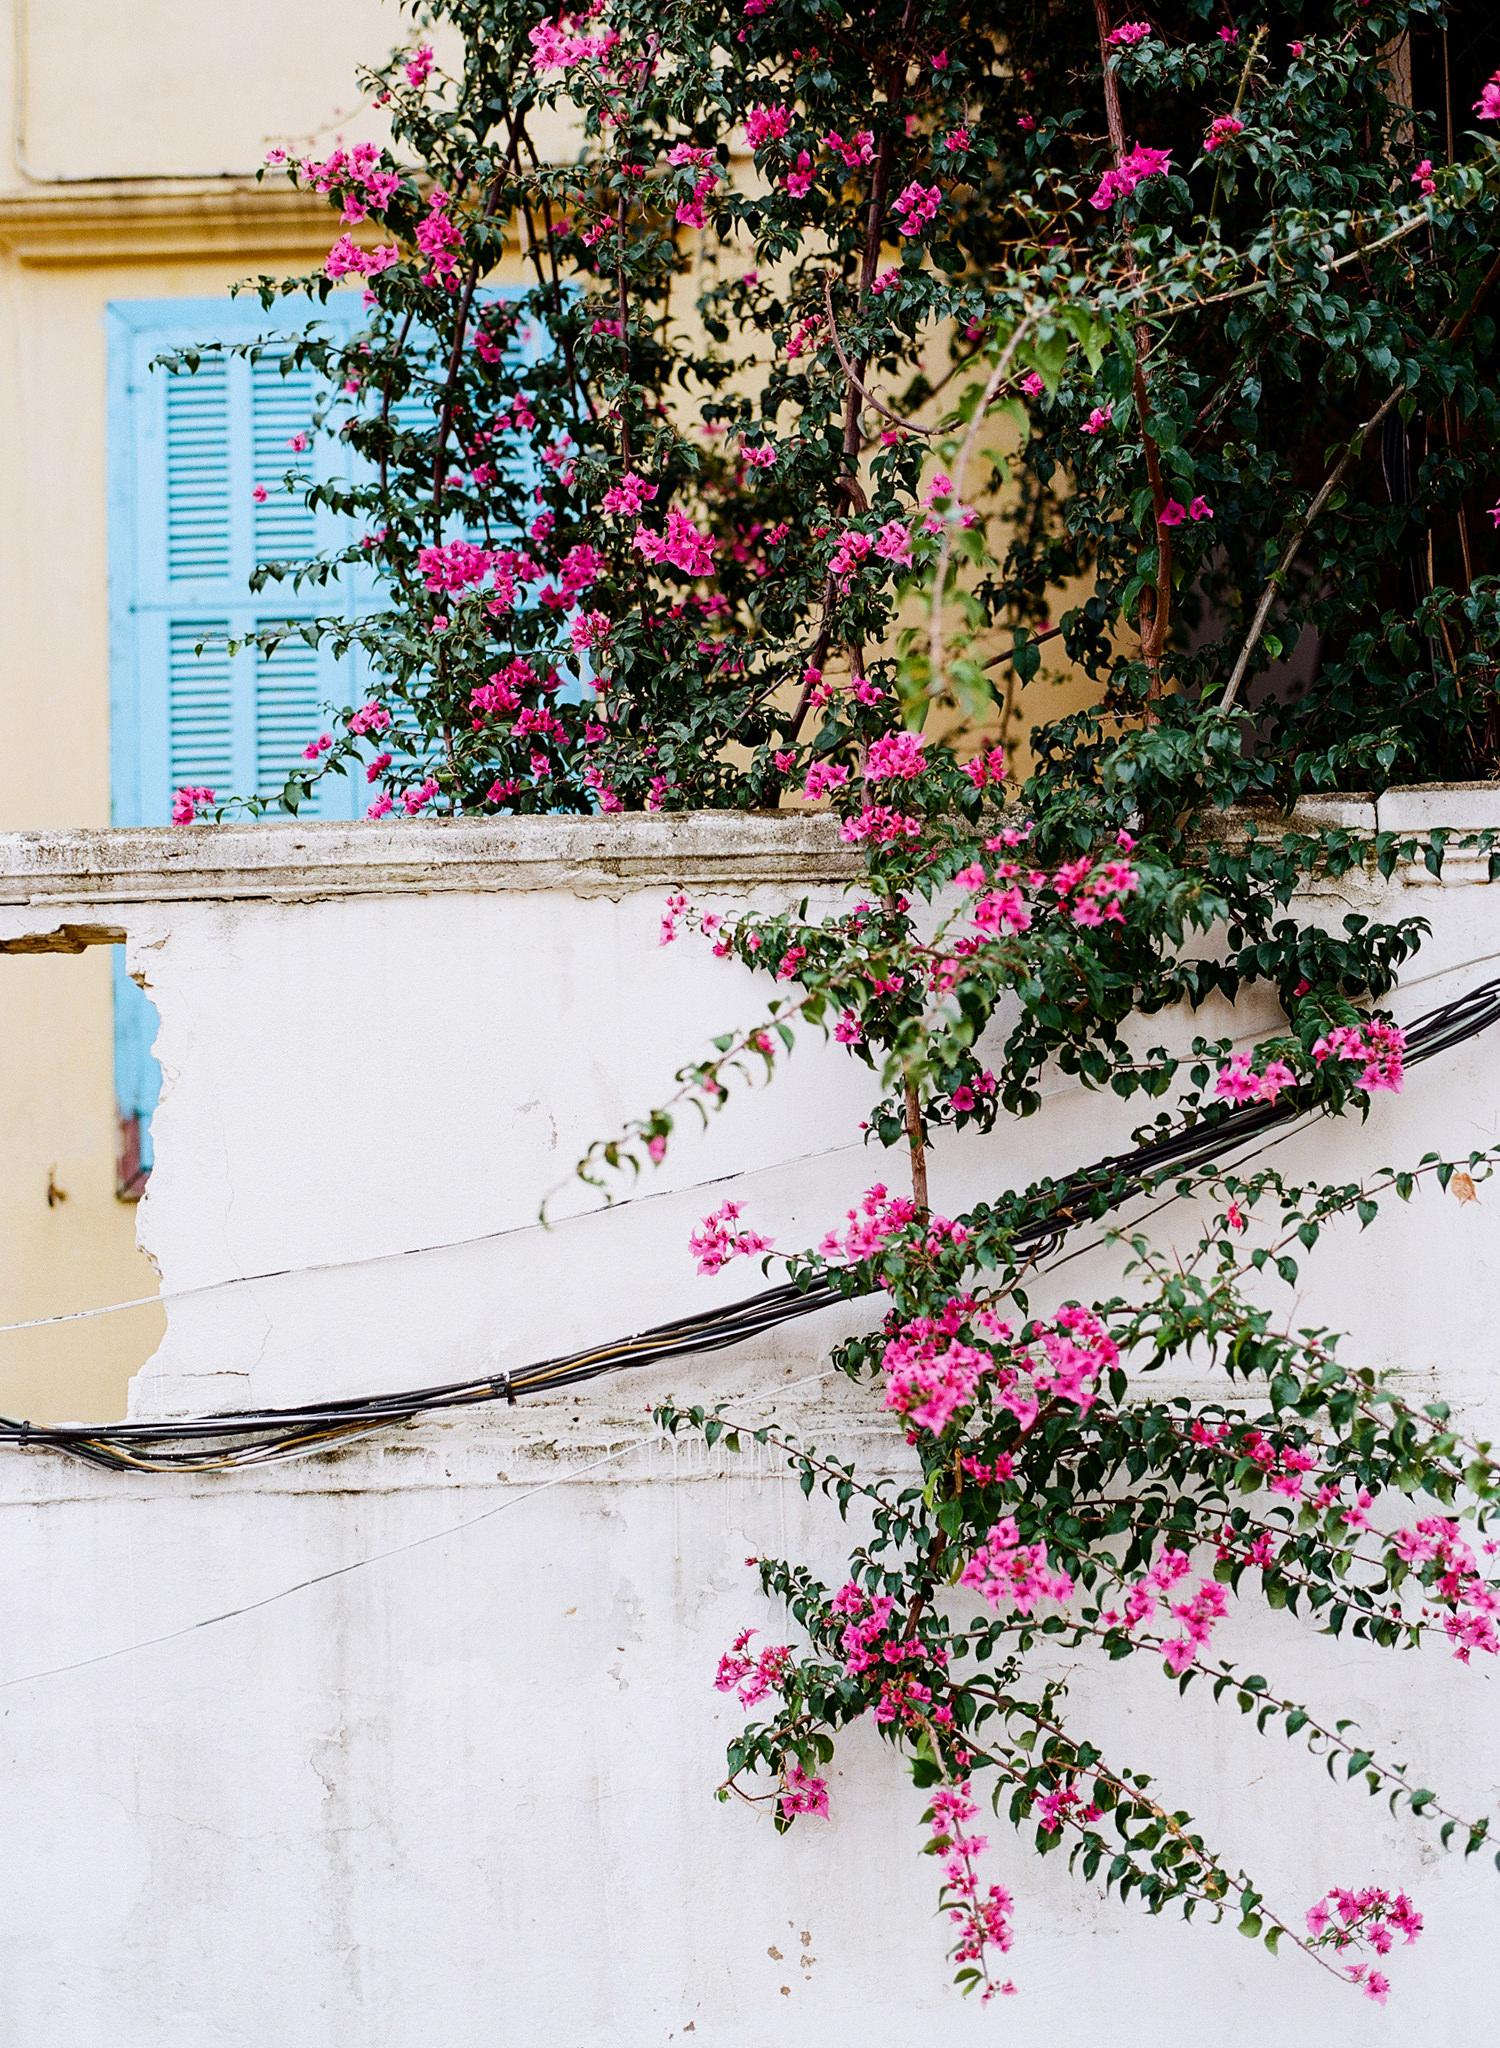 Lebanon-4.jpg